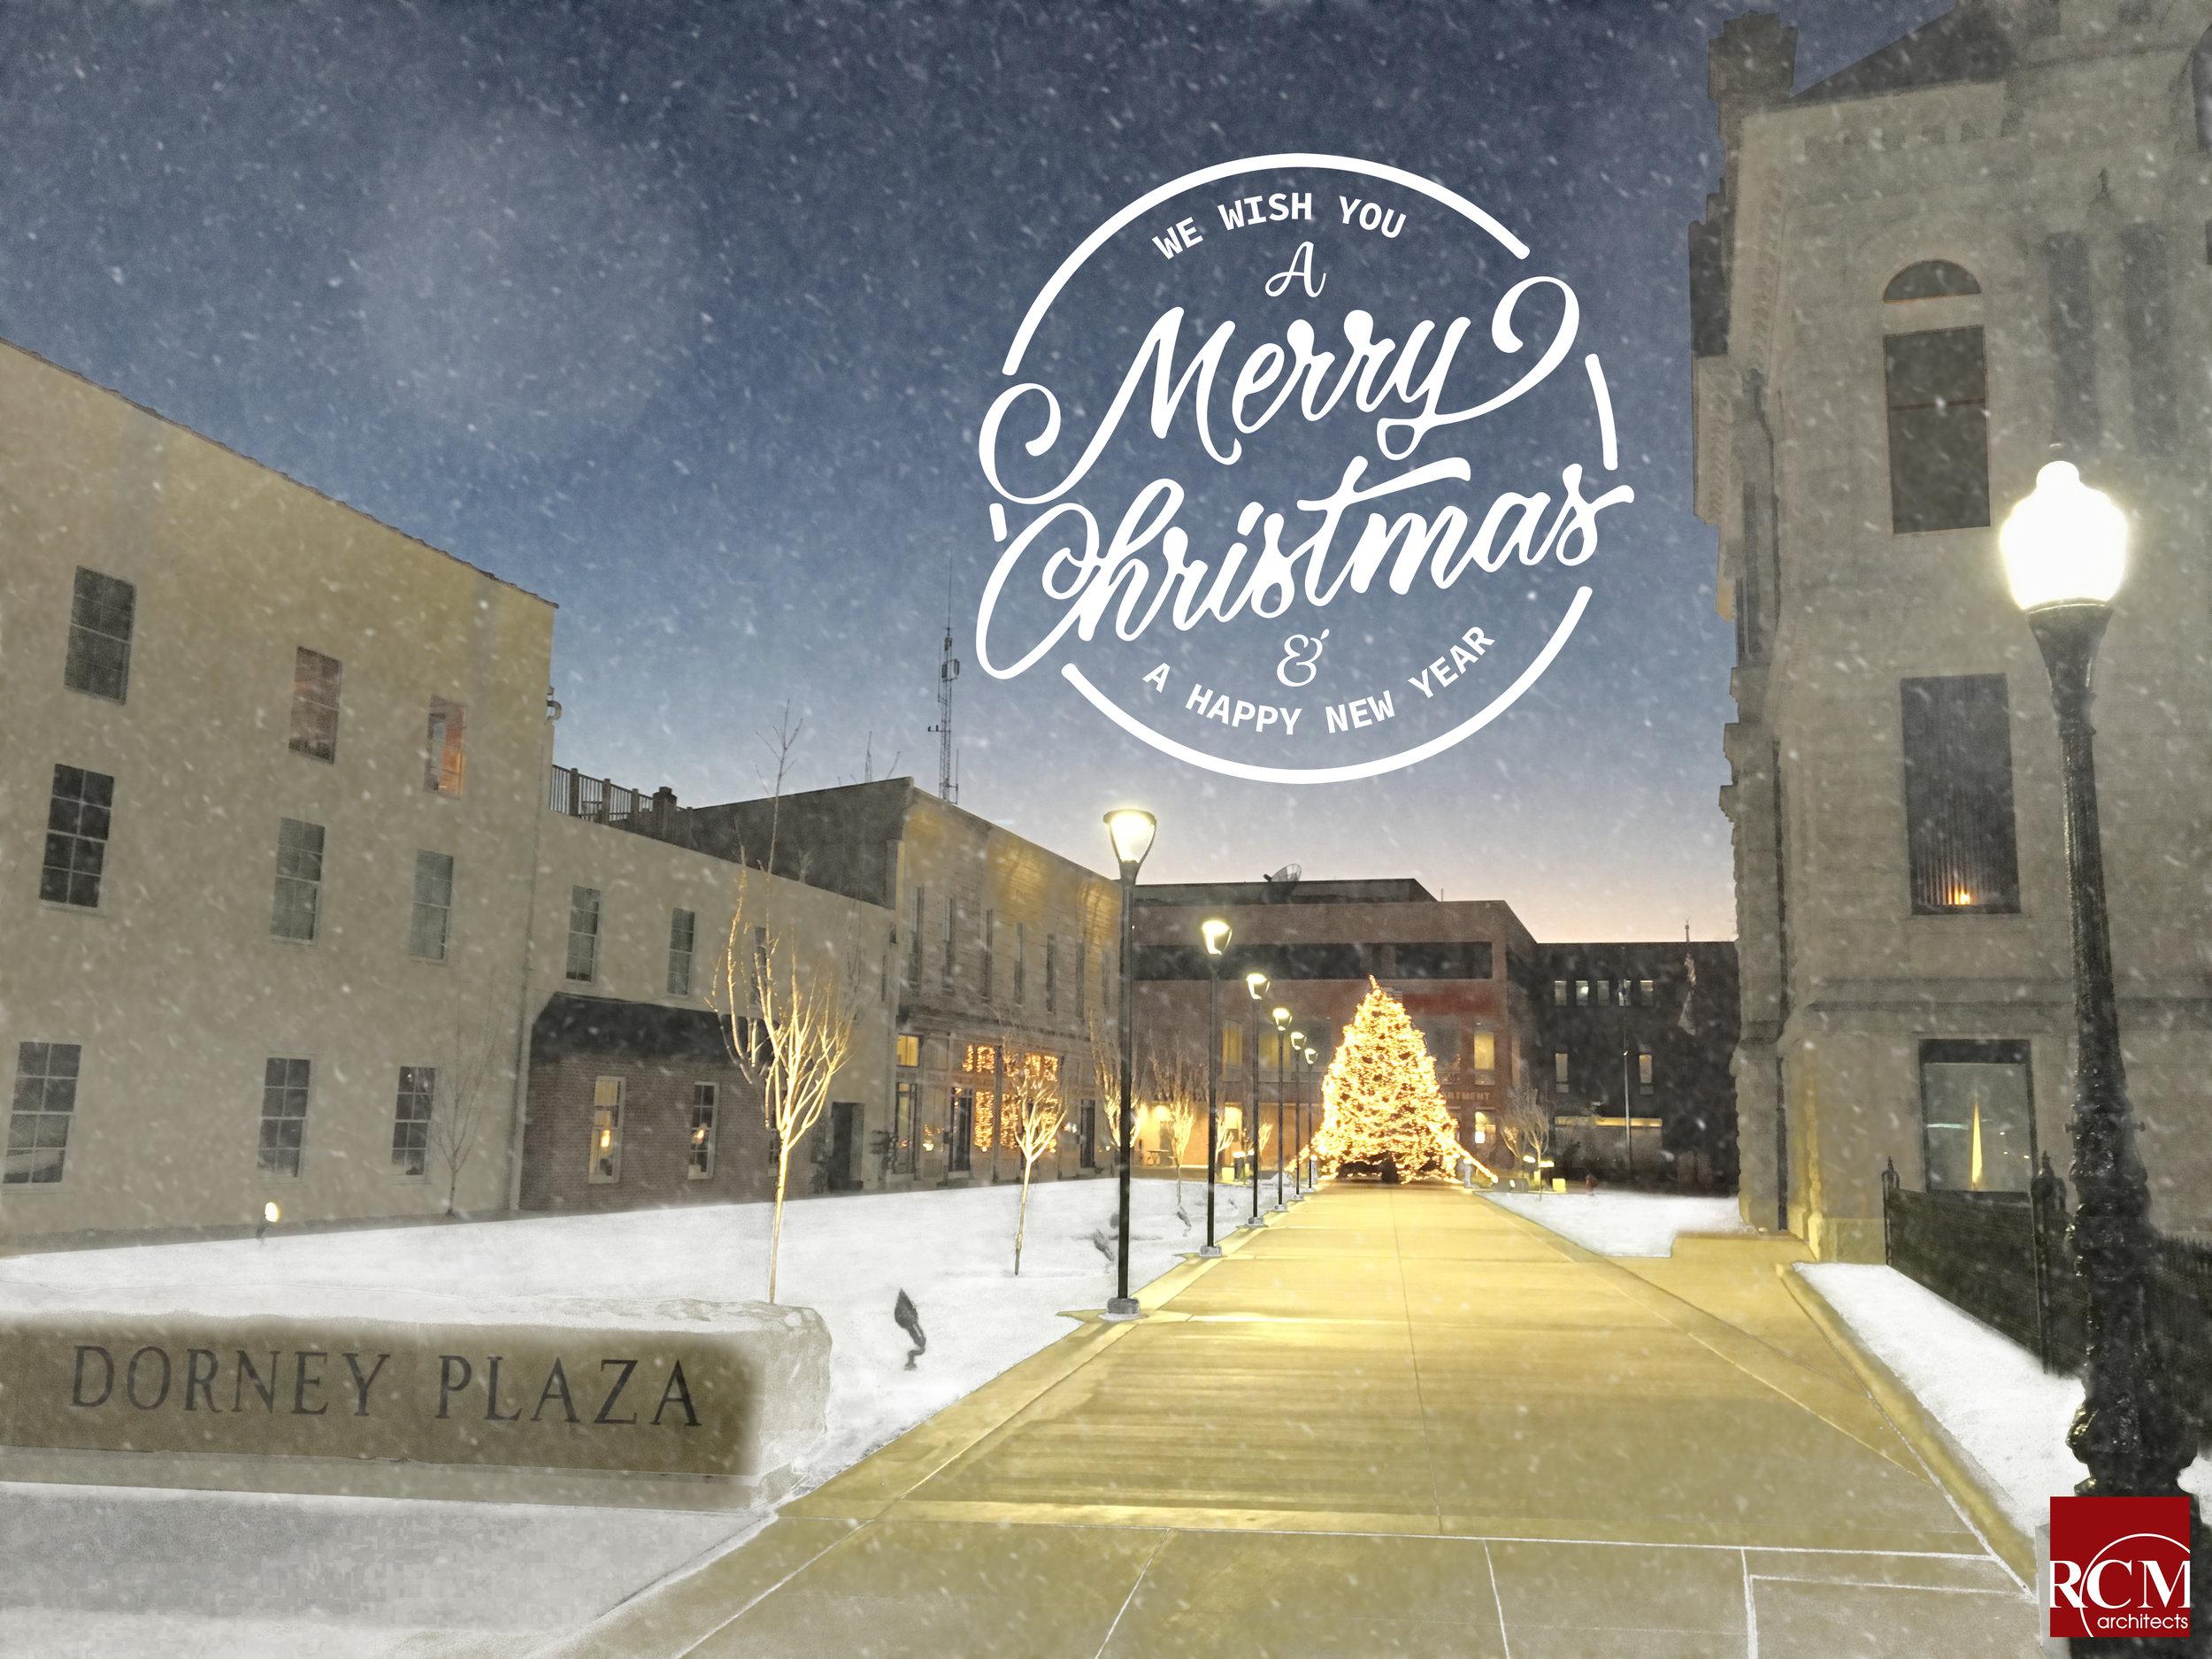 www.rcmarchitects.com Christmas 2017.jpg